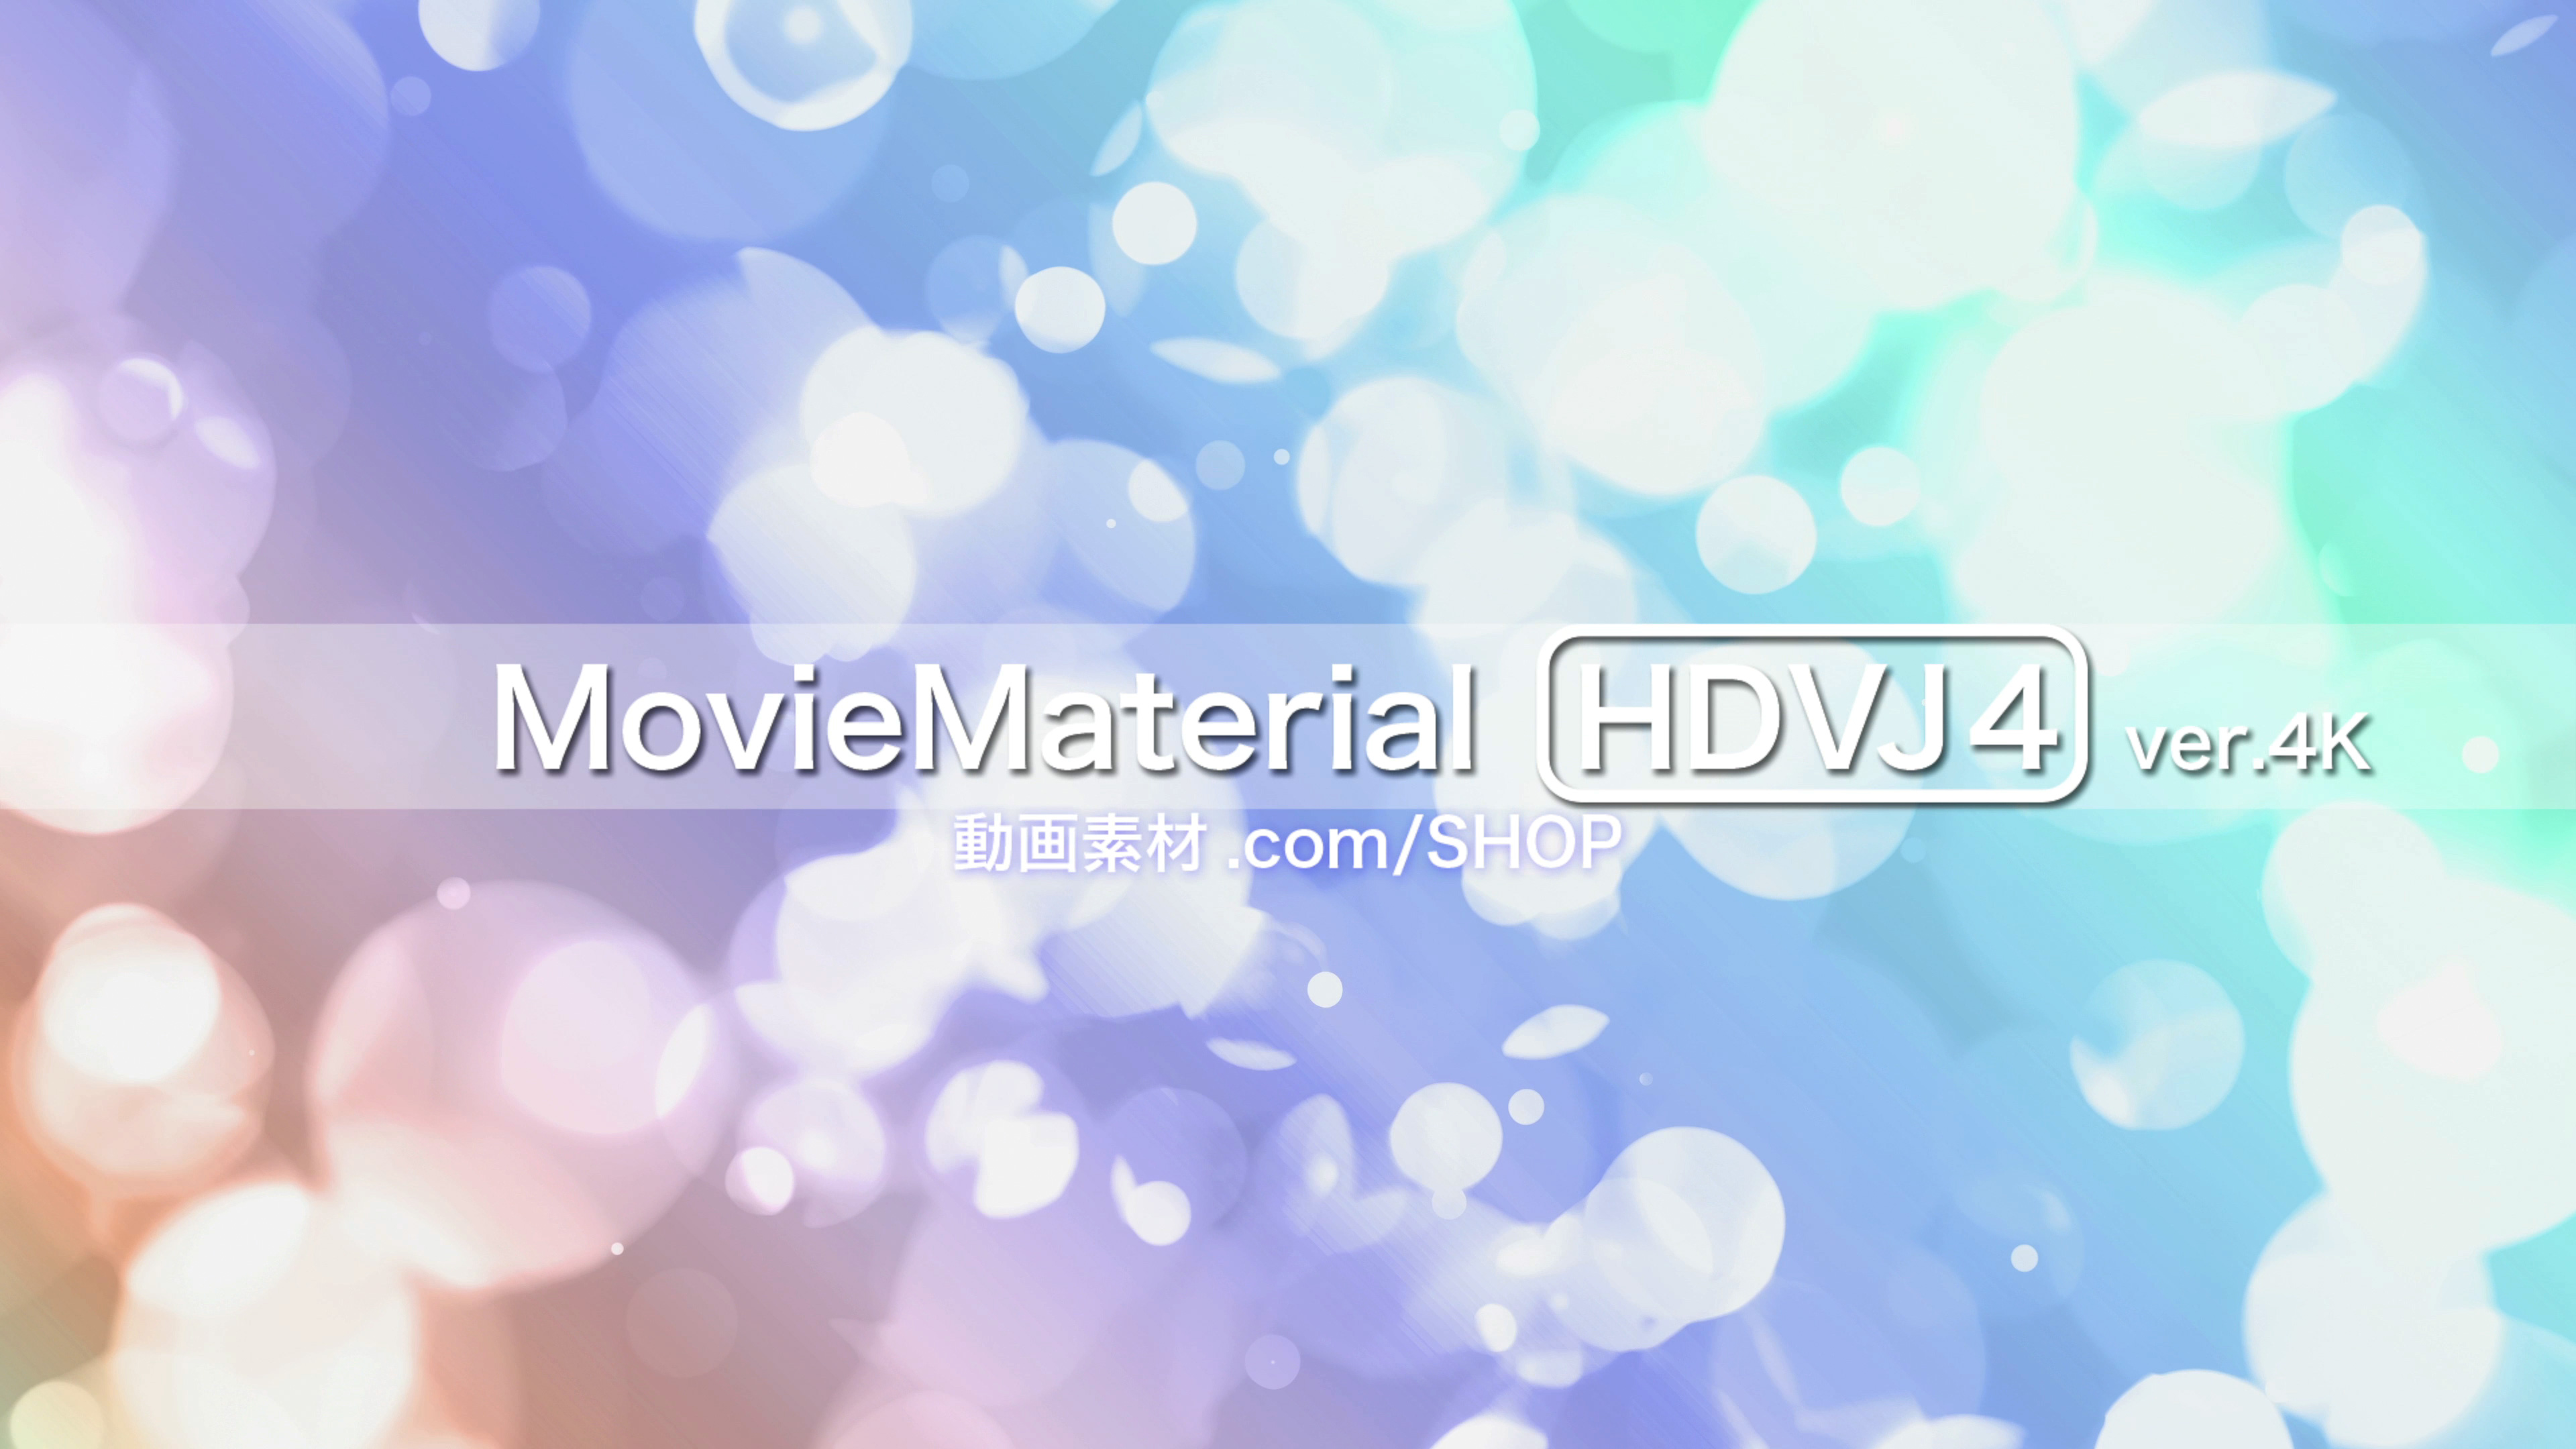 4K2Kループ動画素材集第4段【MovieMaterial HDVJ4 ver.4K】ロイヤリティフリー(著作権使用料無料)4